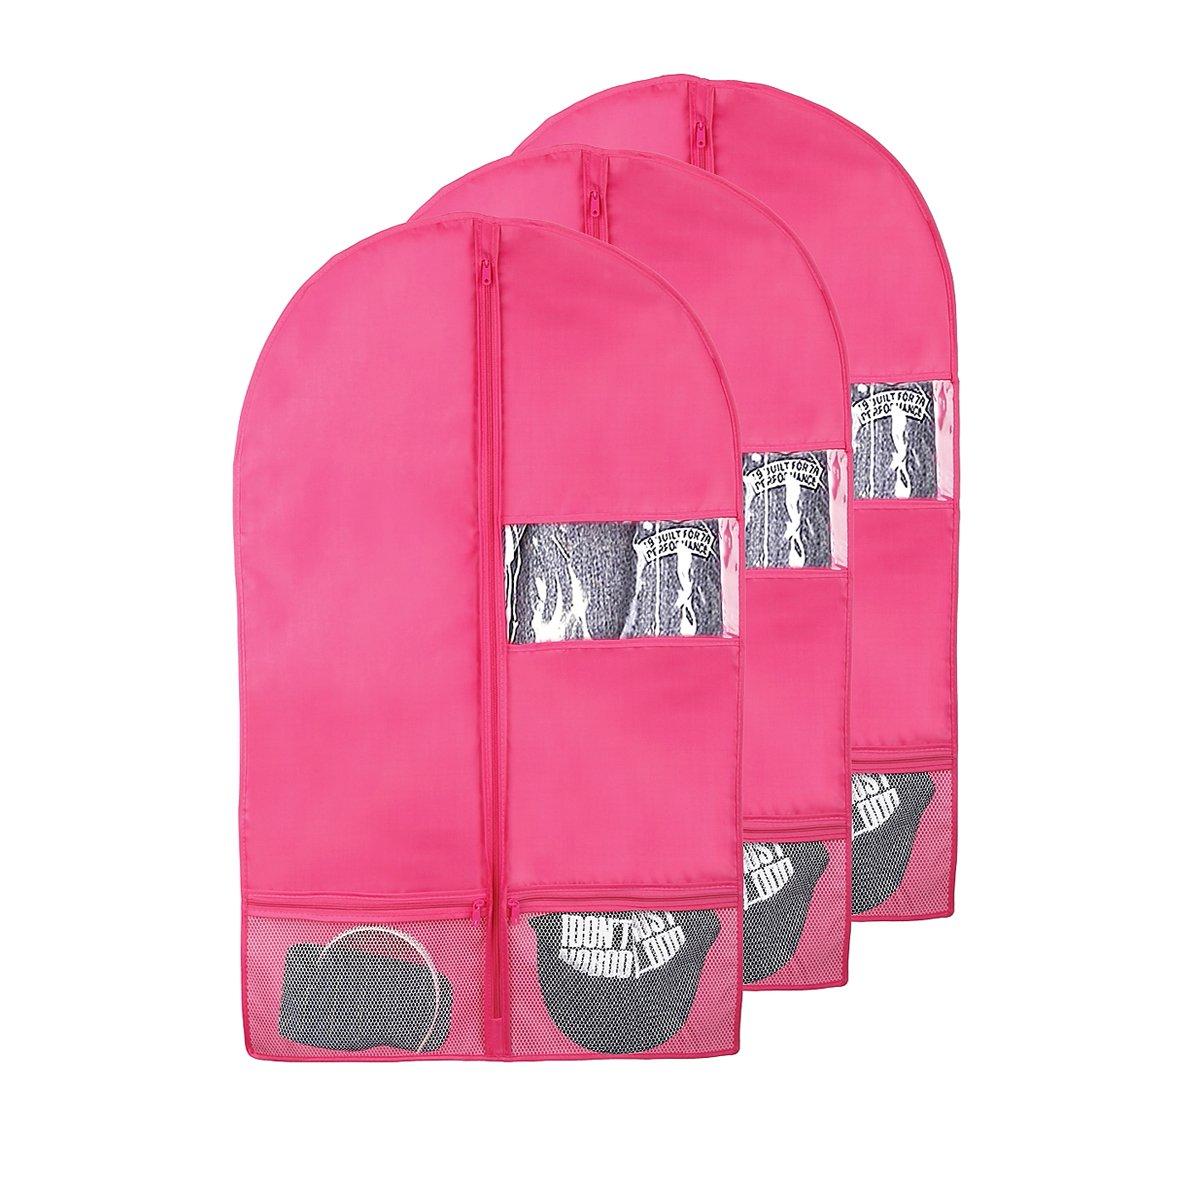 1f4b10802ed9 Kernorv Garment Bags for Dance Costumes, 36